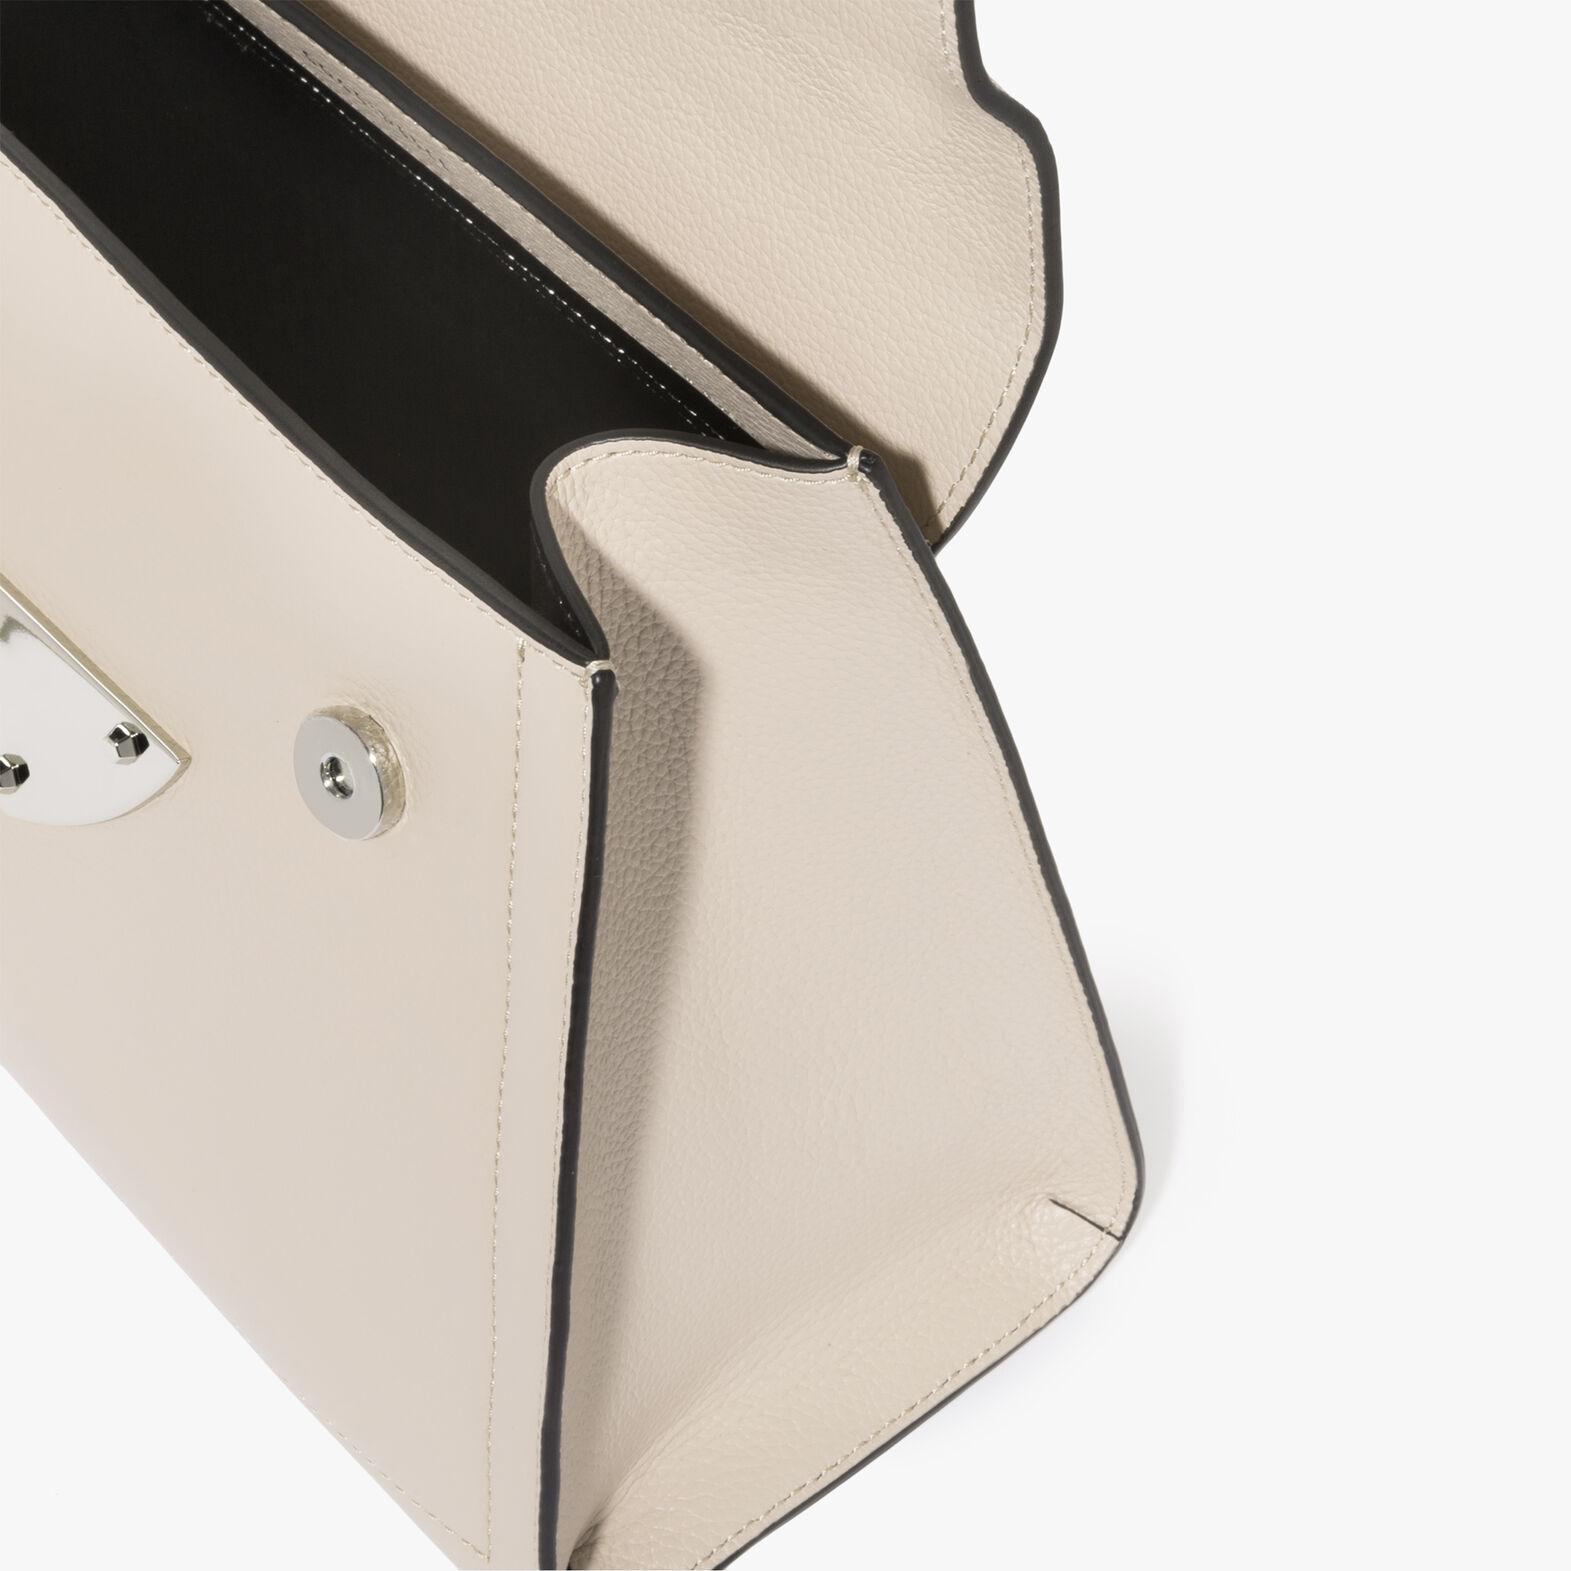 Coccinelle B14 leather handbag